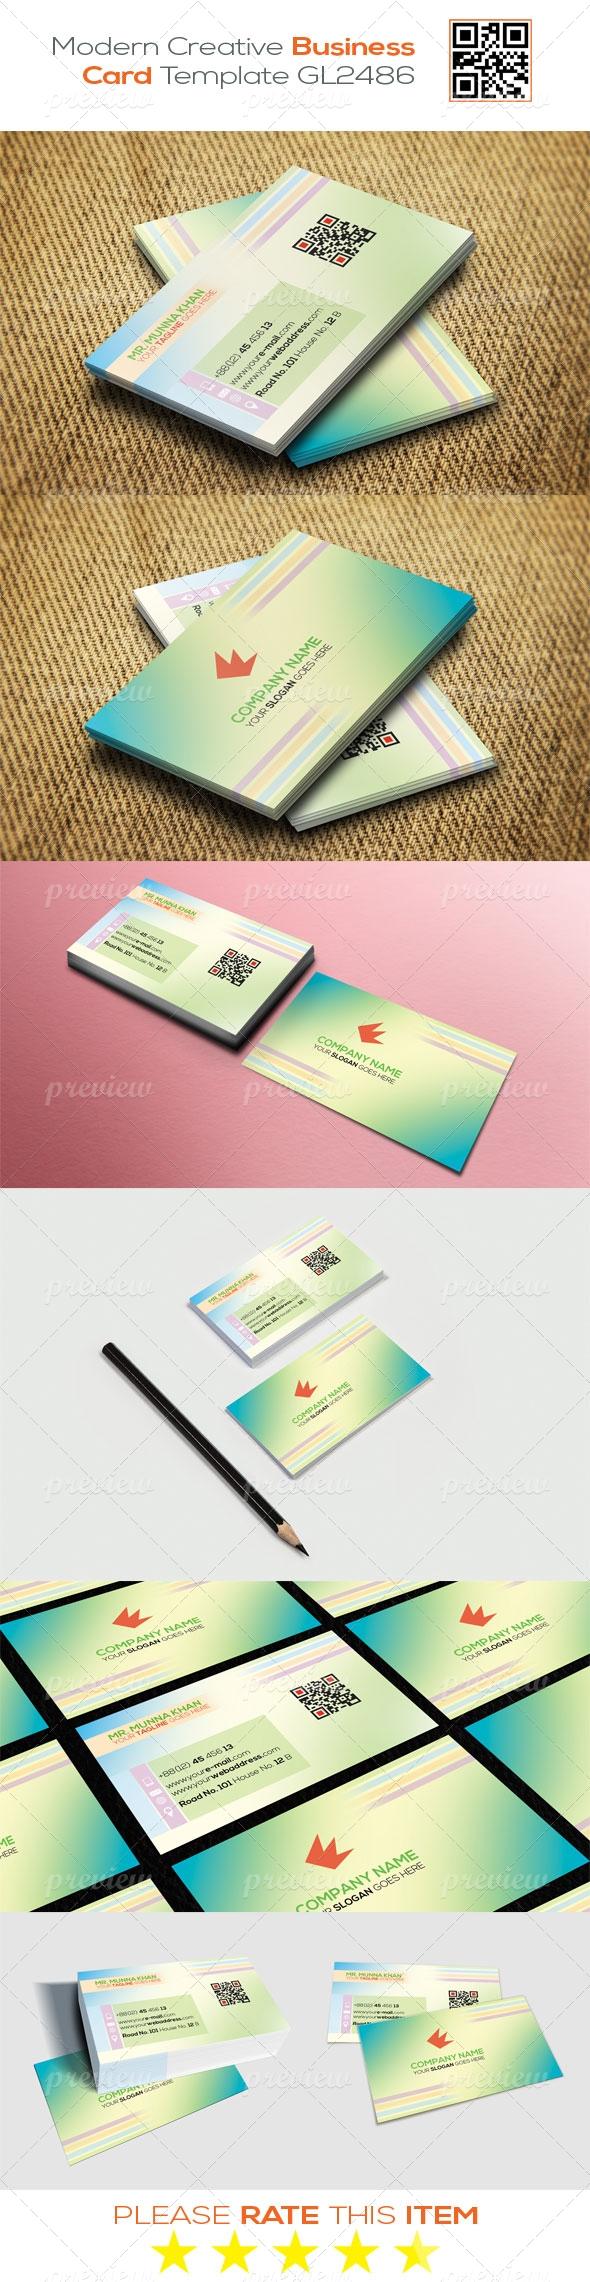 Modern Creative Business Card Template GL2486